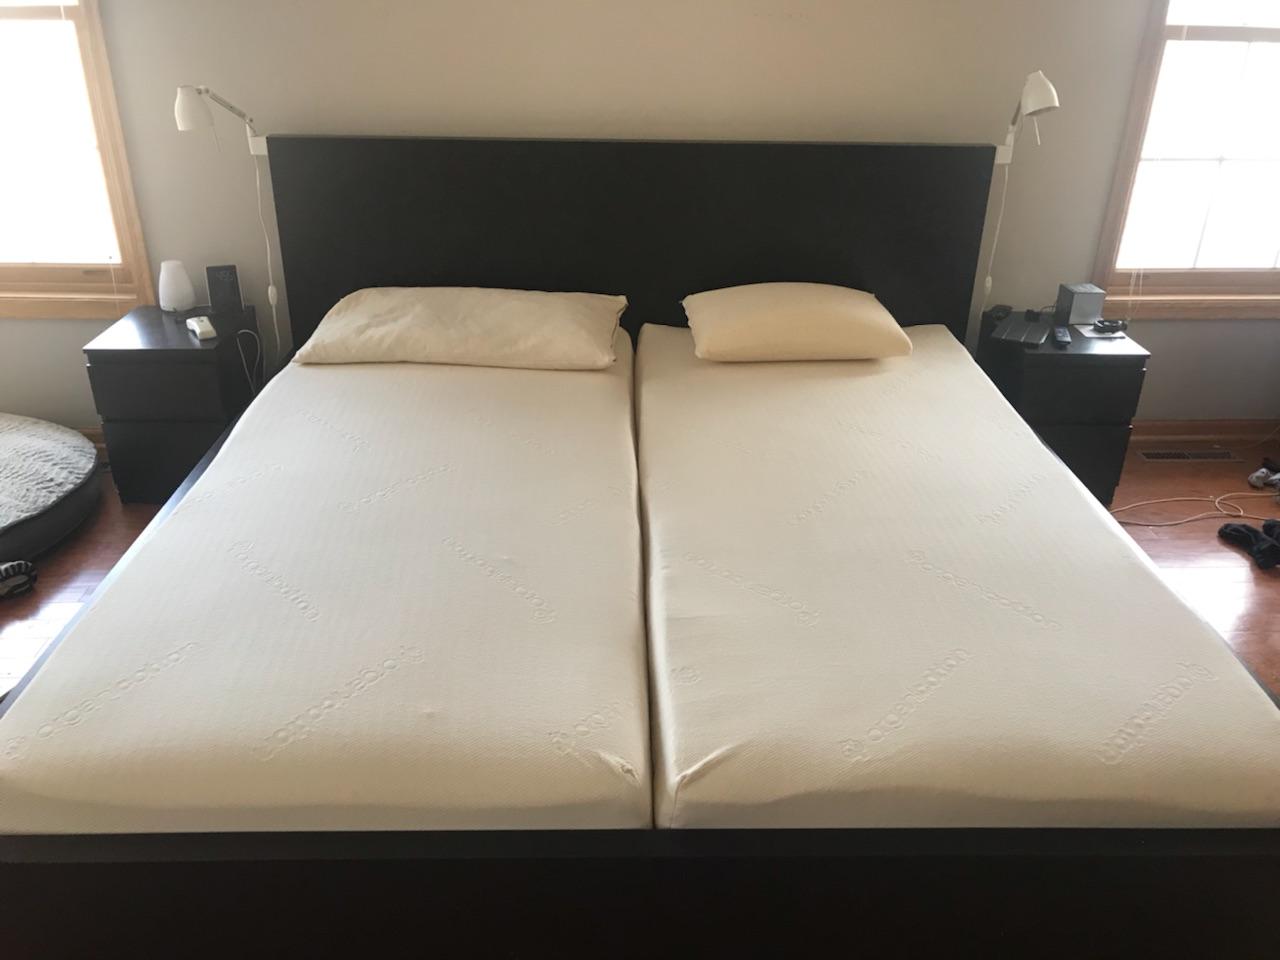 DIY organic mattress